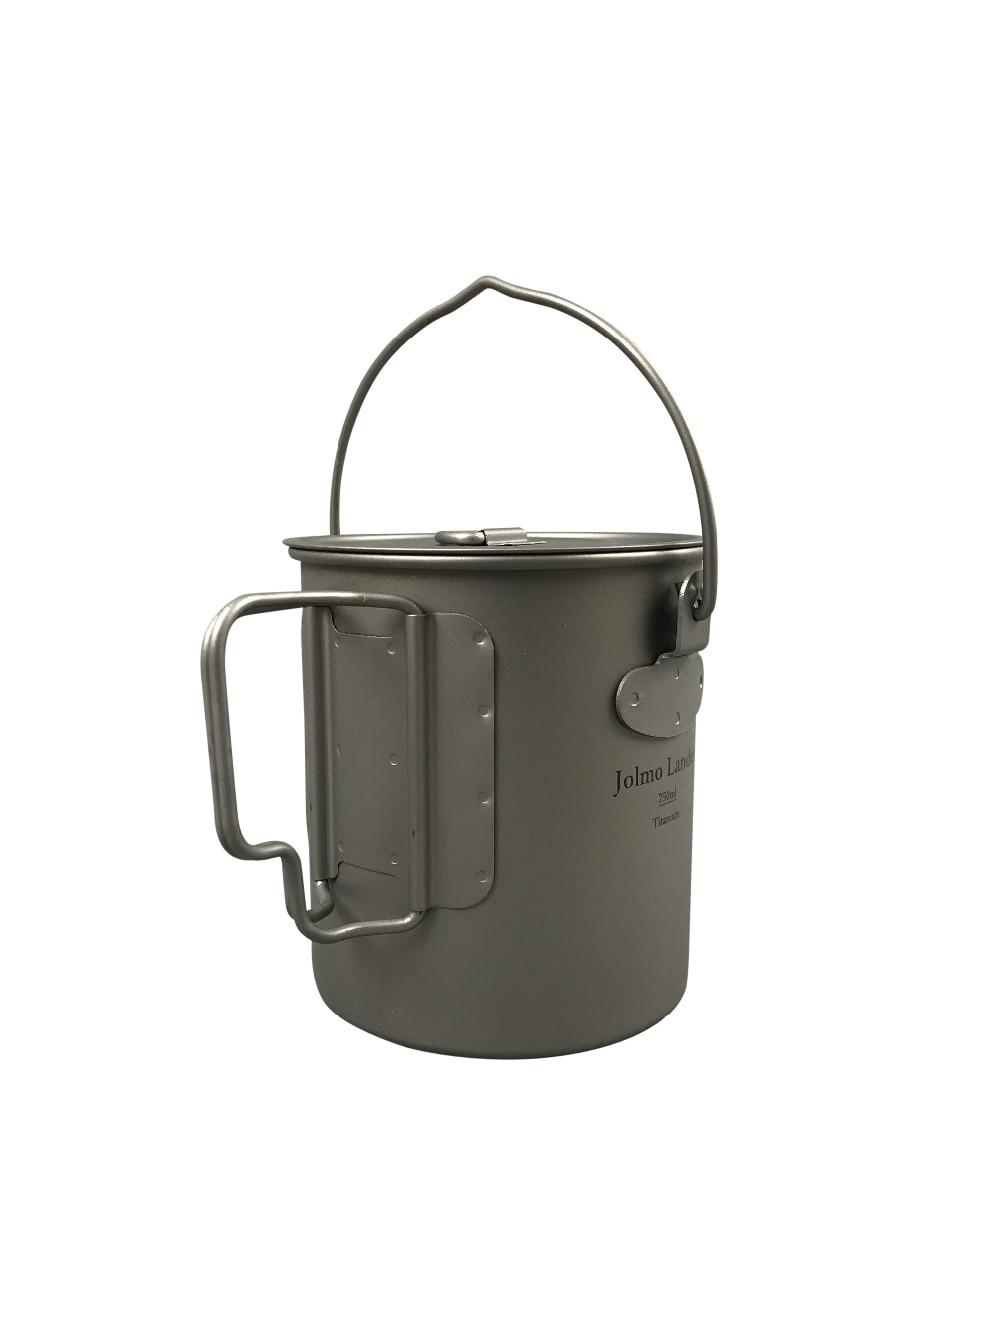 Jolmo Lander Titanium Pot with Bail Handle Outdoor Ultralight Folding Pot 750ml clairol 750ml